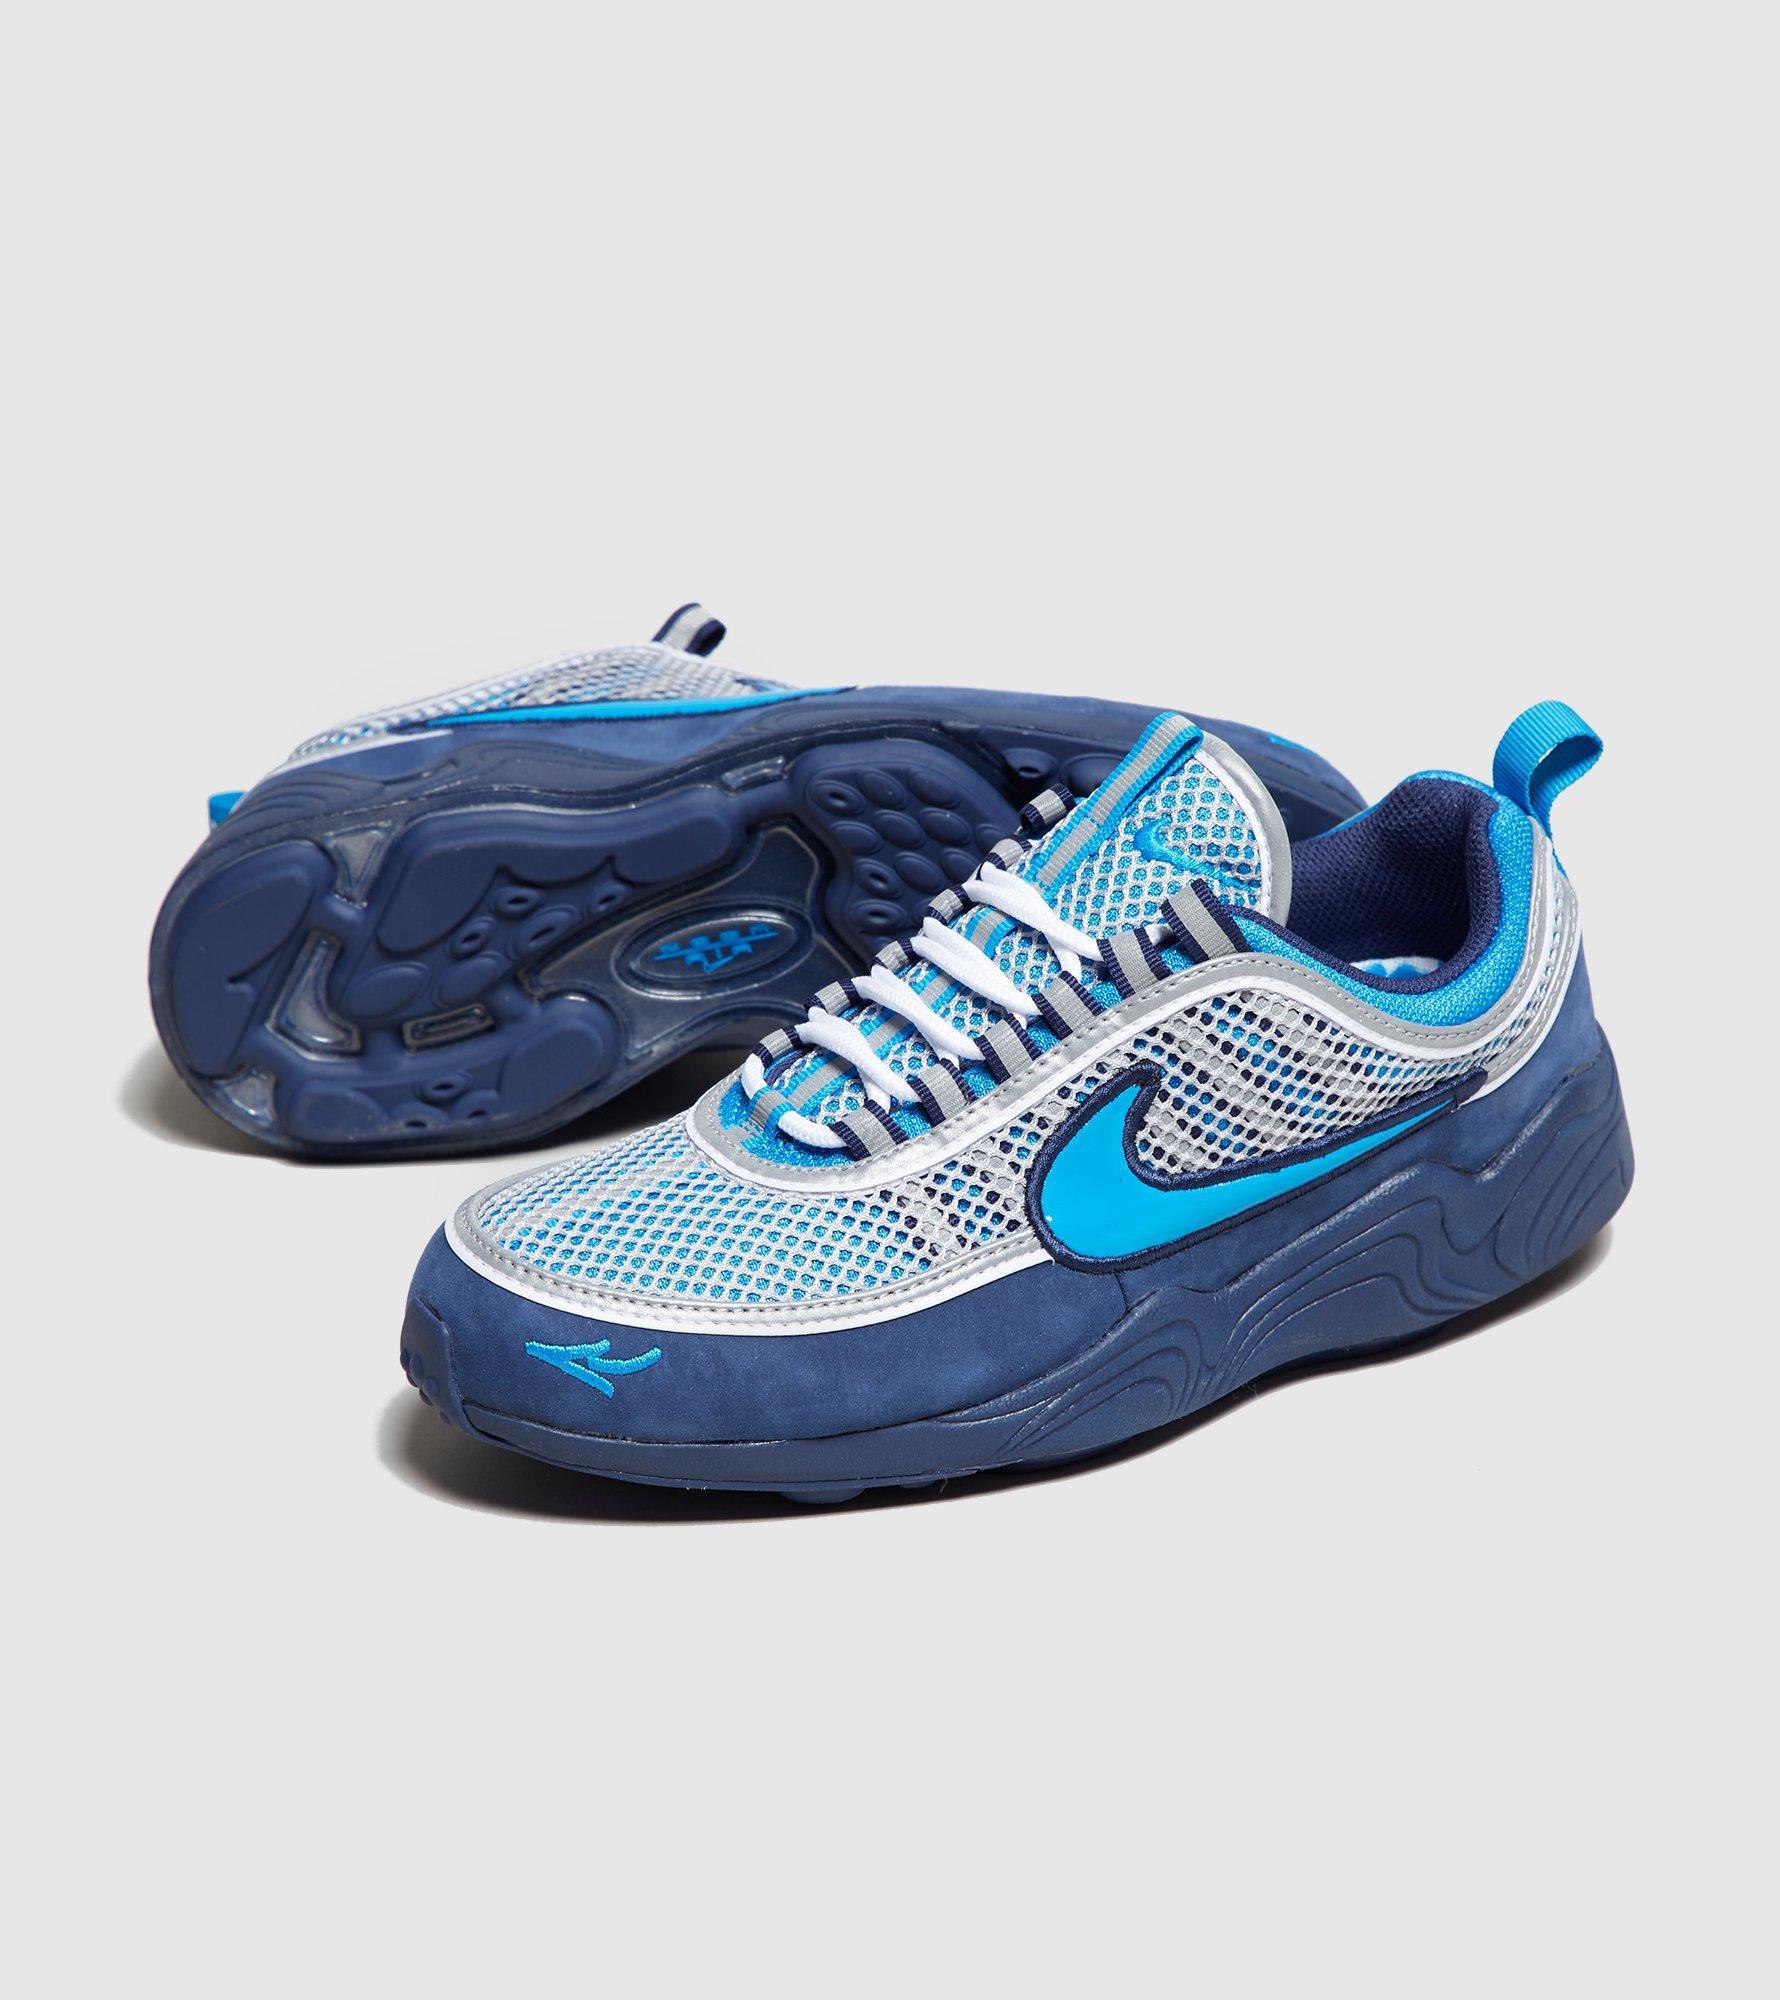 bc65092b00b8 Lyst - Nike X Stash Spiridon Sp in Blue for Men